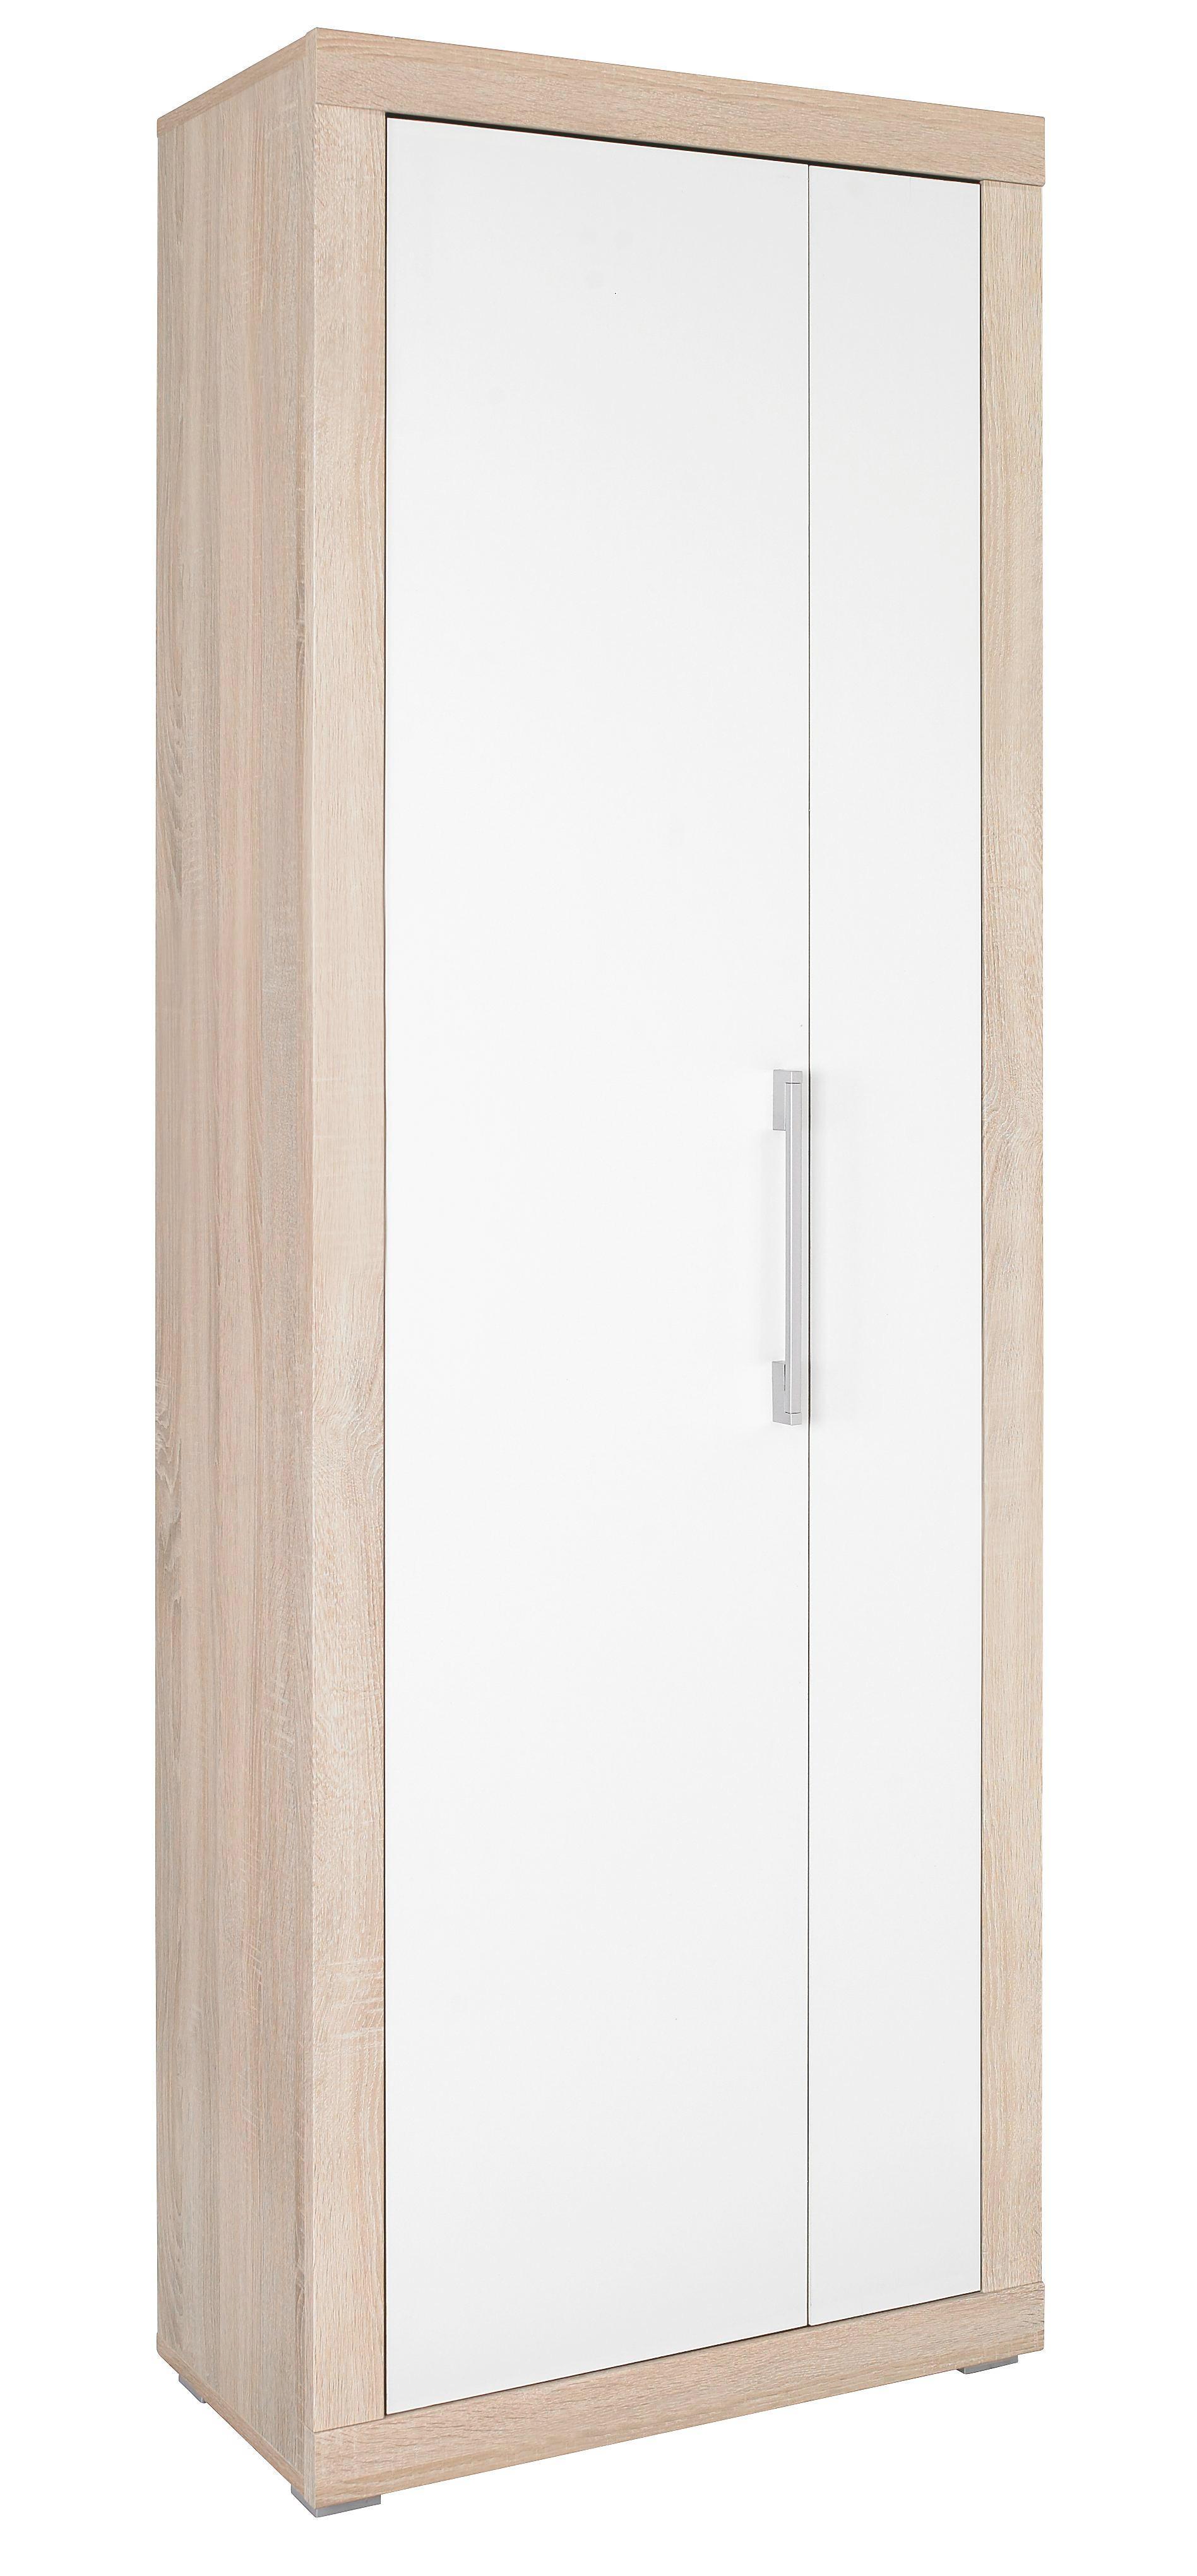 ORMAR - bijela/boje srebra, Design, drvni materijal (69/198/36cm) - BOXXX